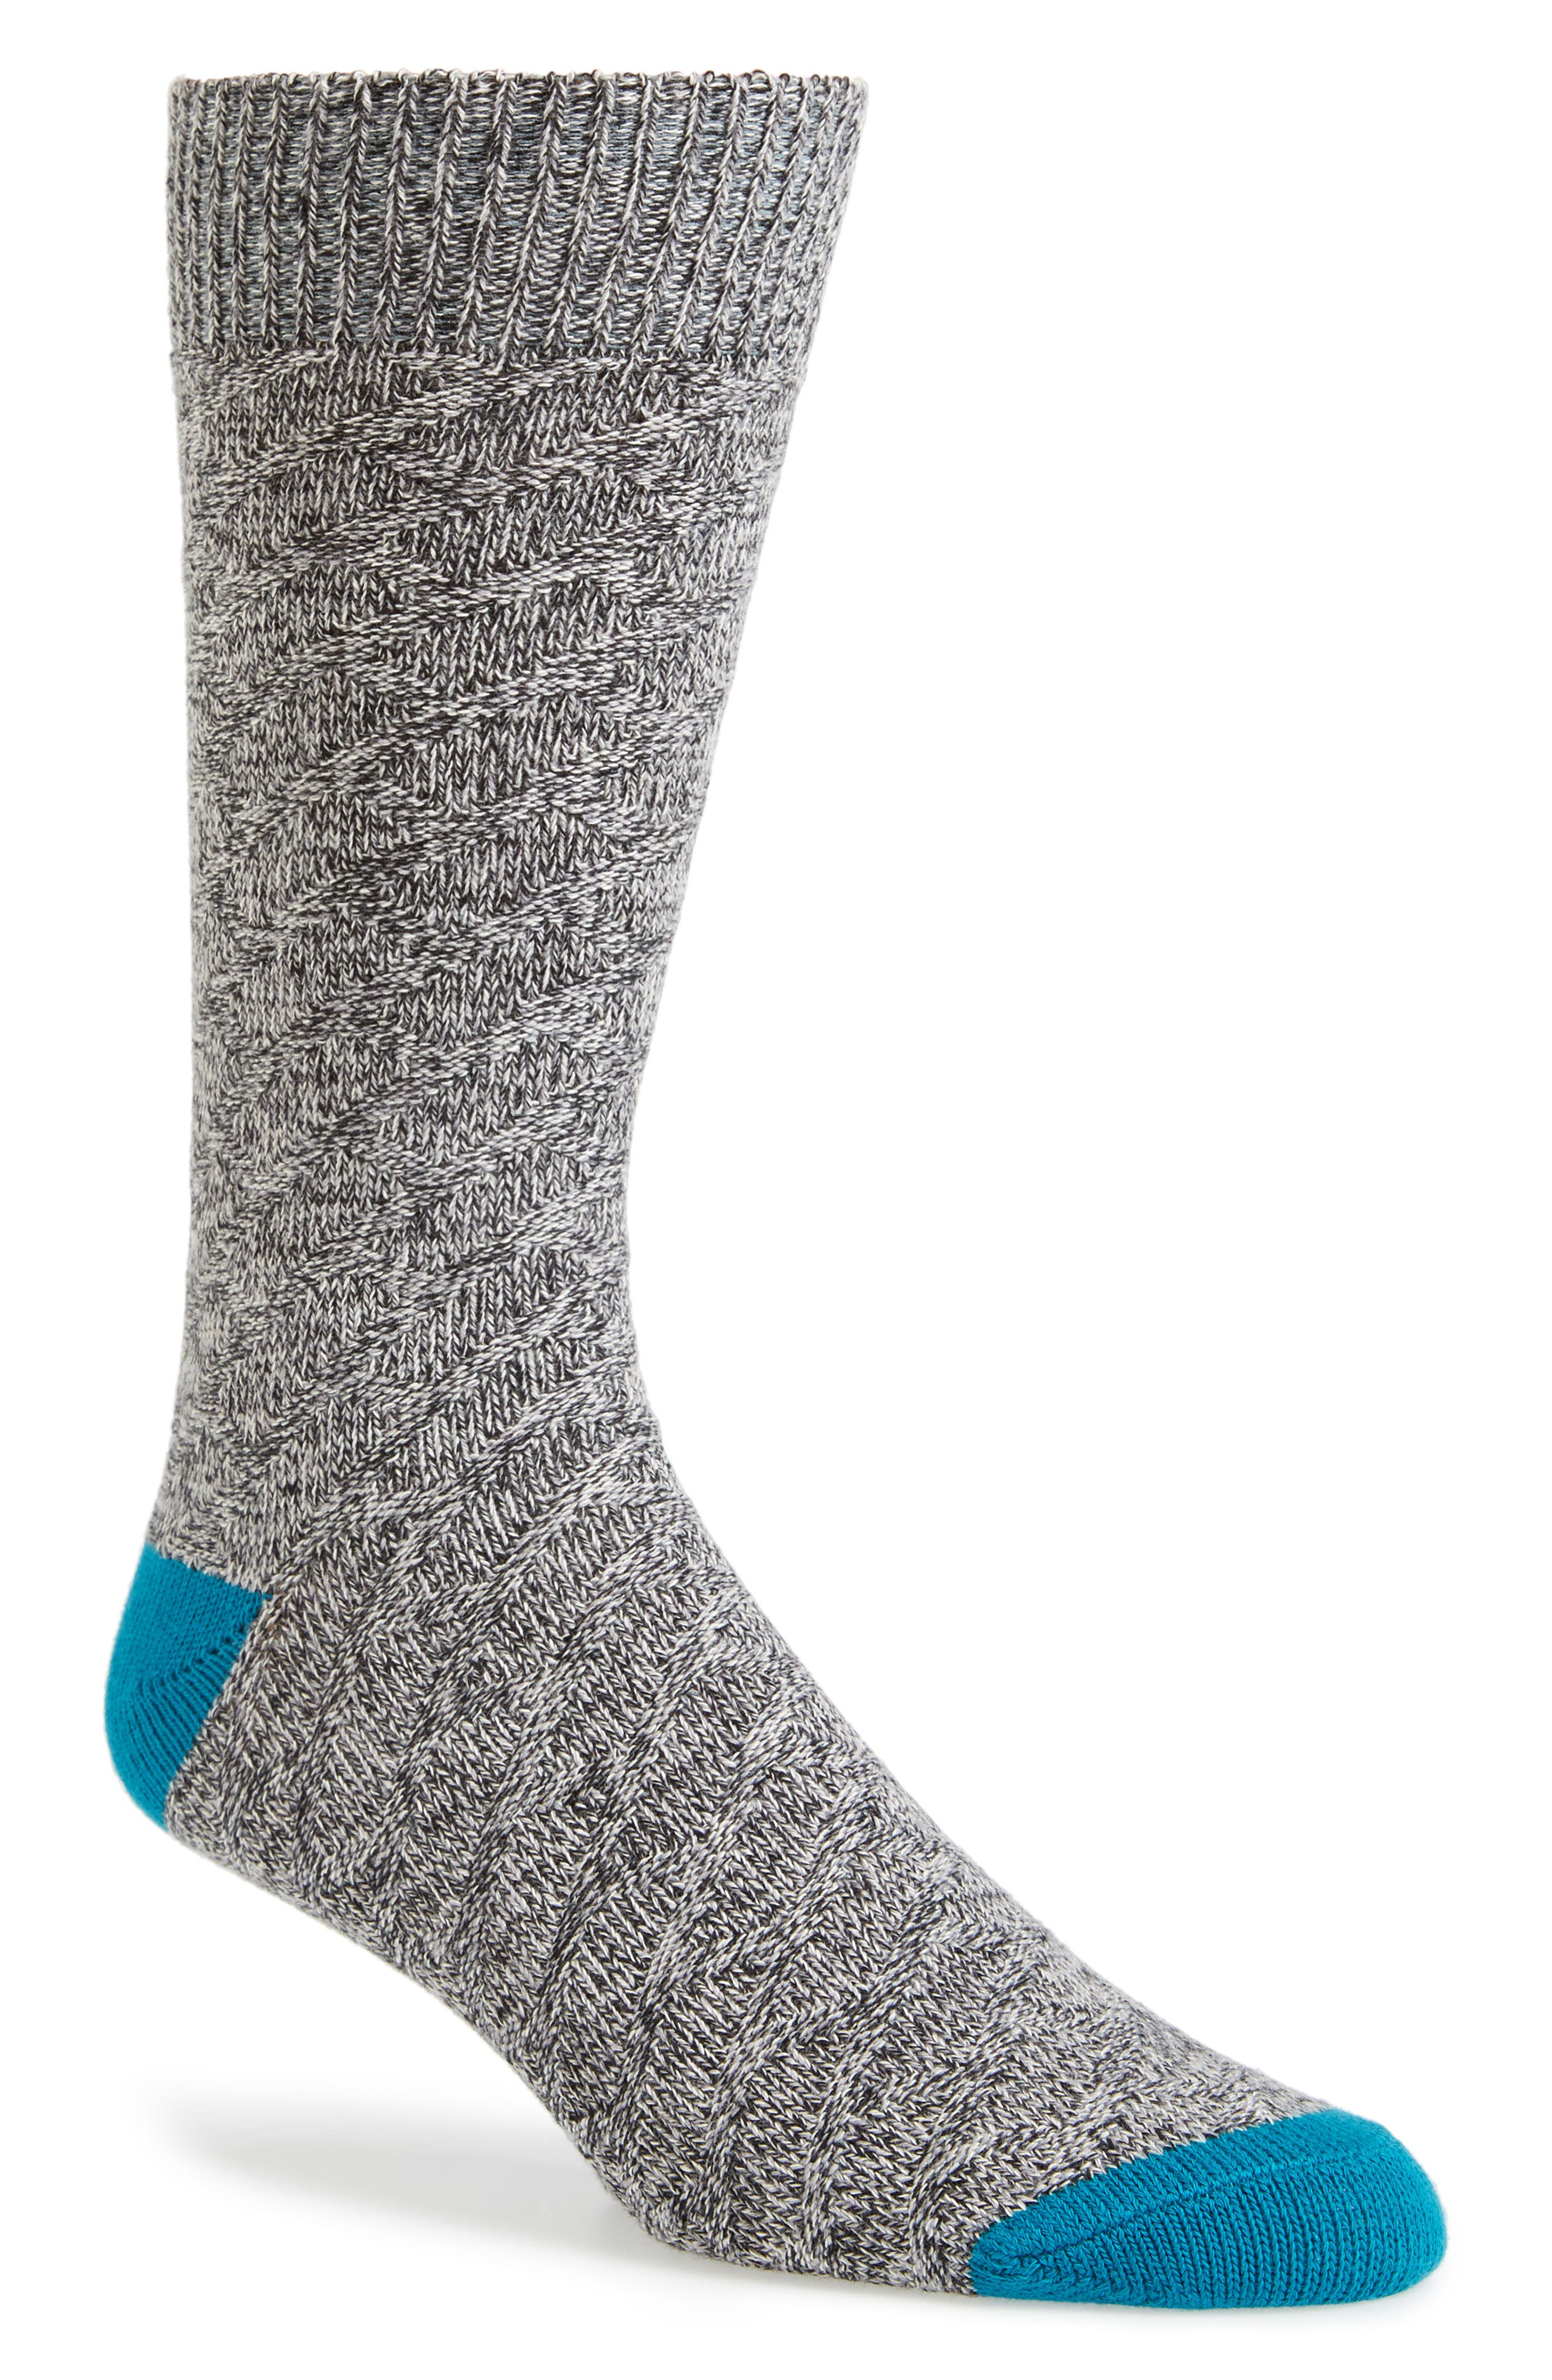 Icart Solid Socks,                         Main,                         color, 021